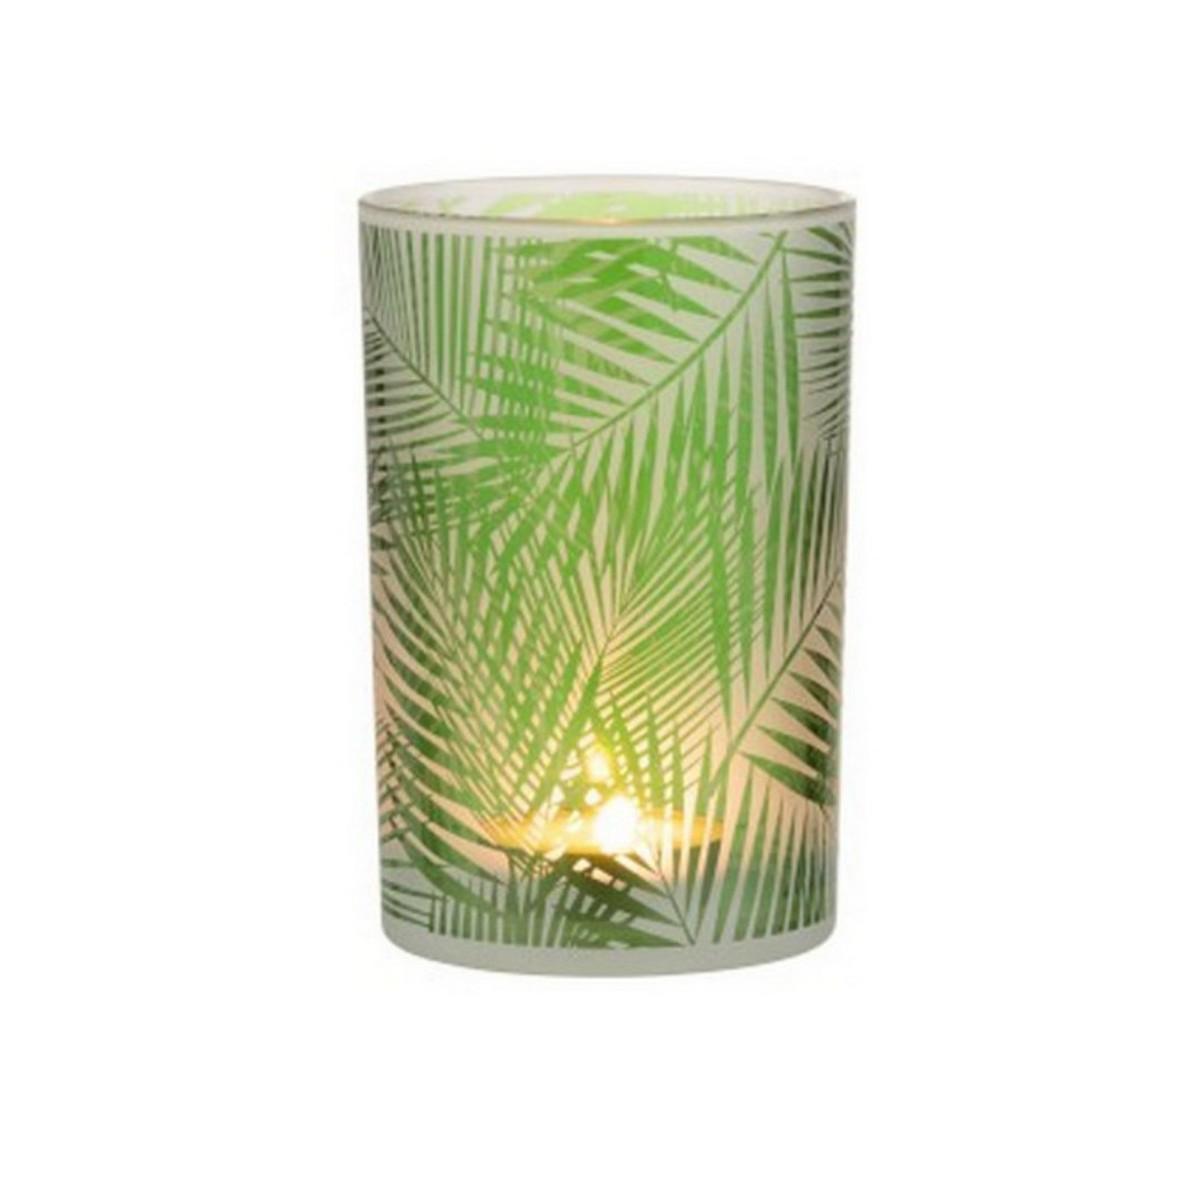 Photophore tropical en verre